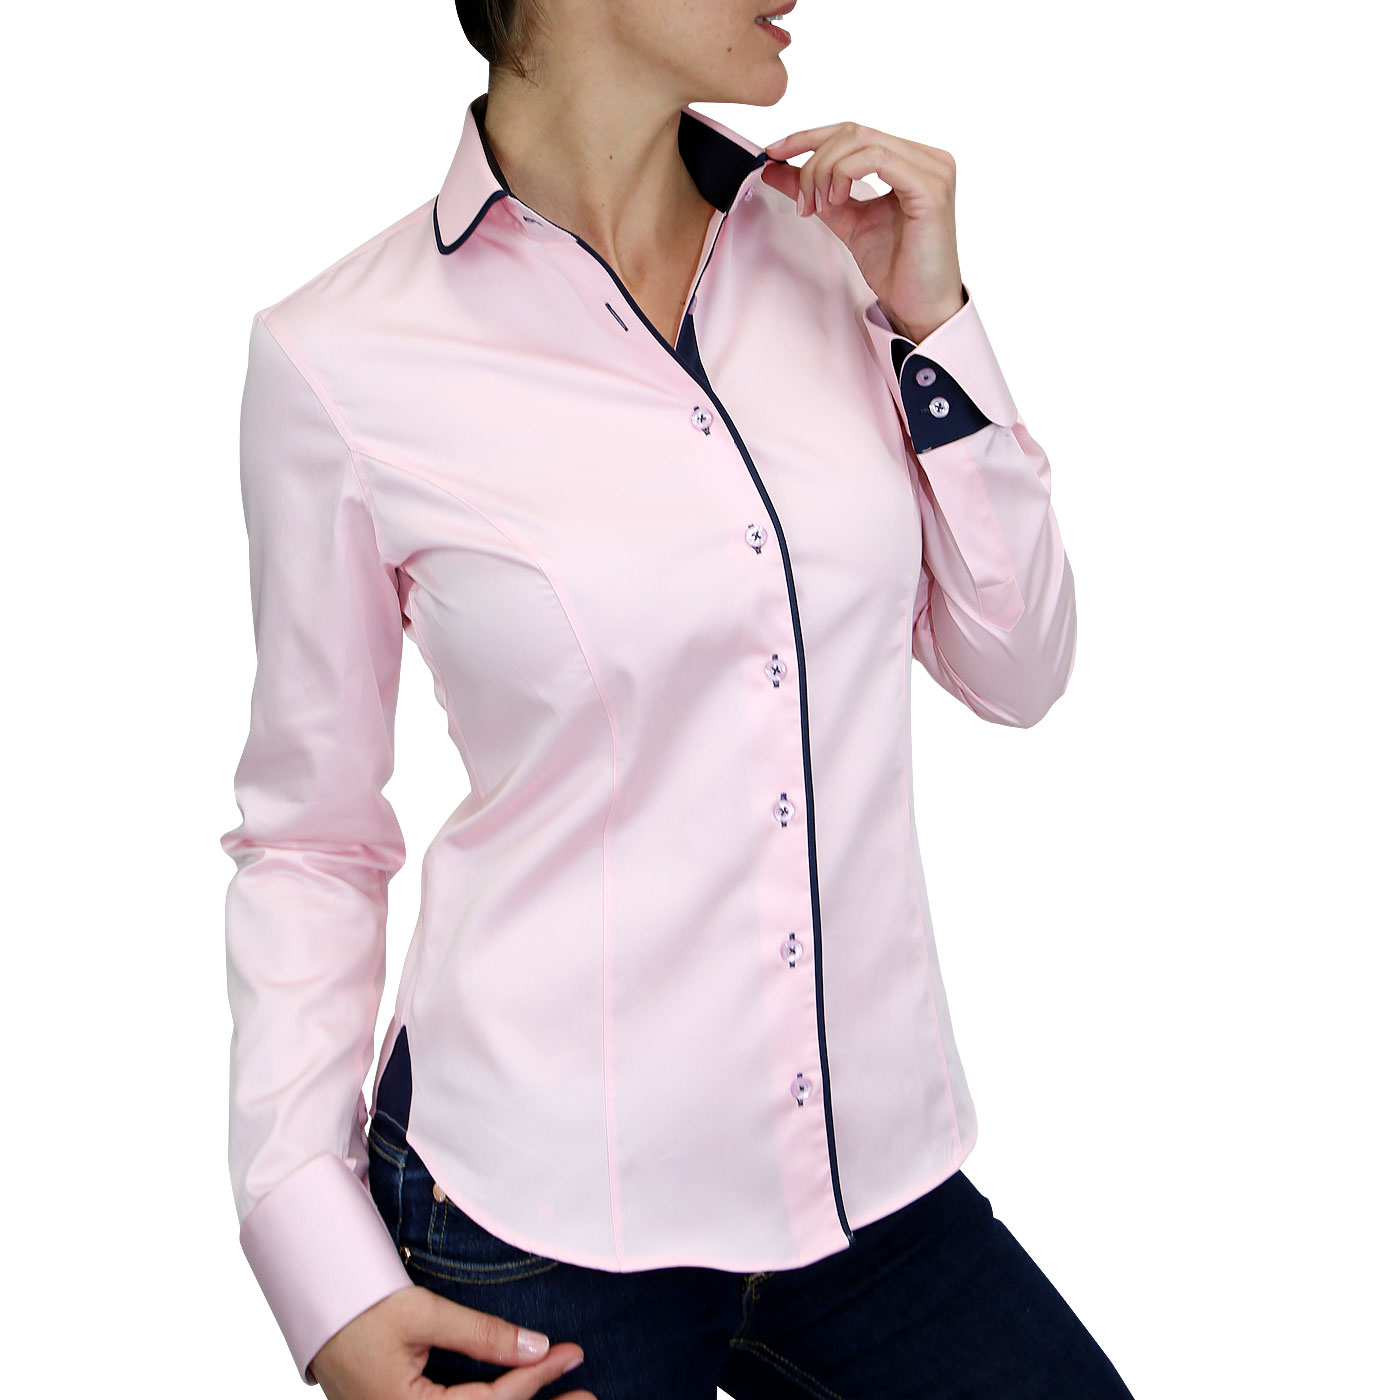 chemise rose mode ou classique 600 mod les en ligne. Black Bedroom Furniture Sets. Home Design Ideas